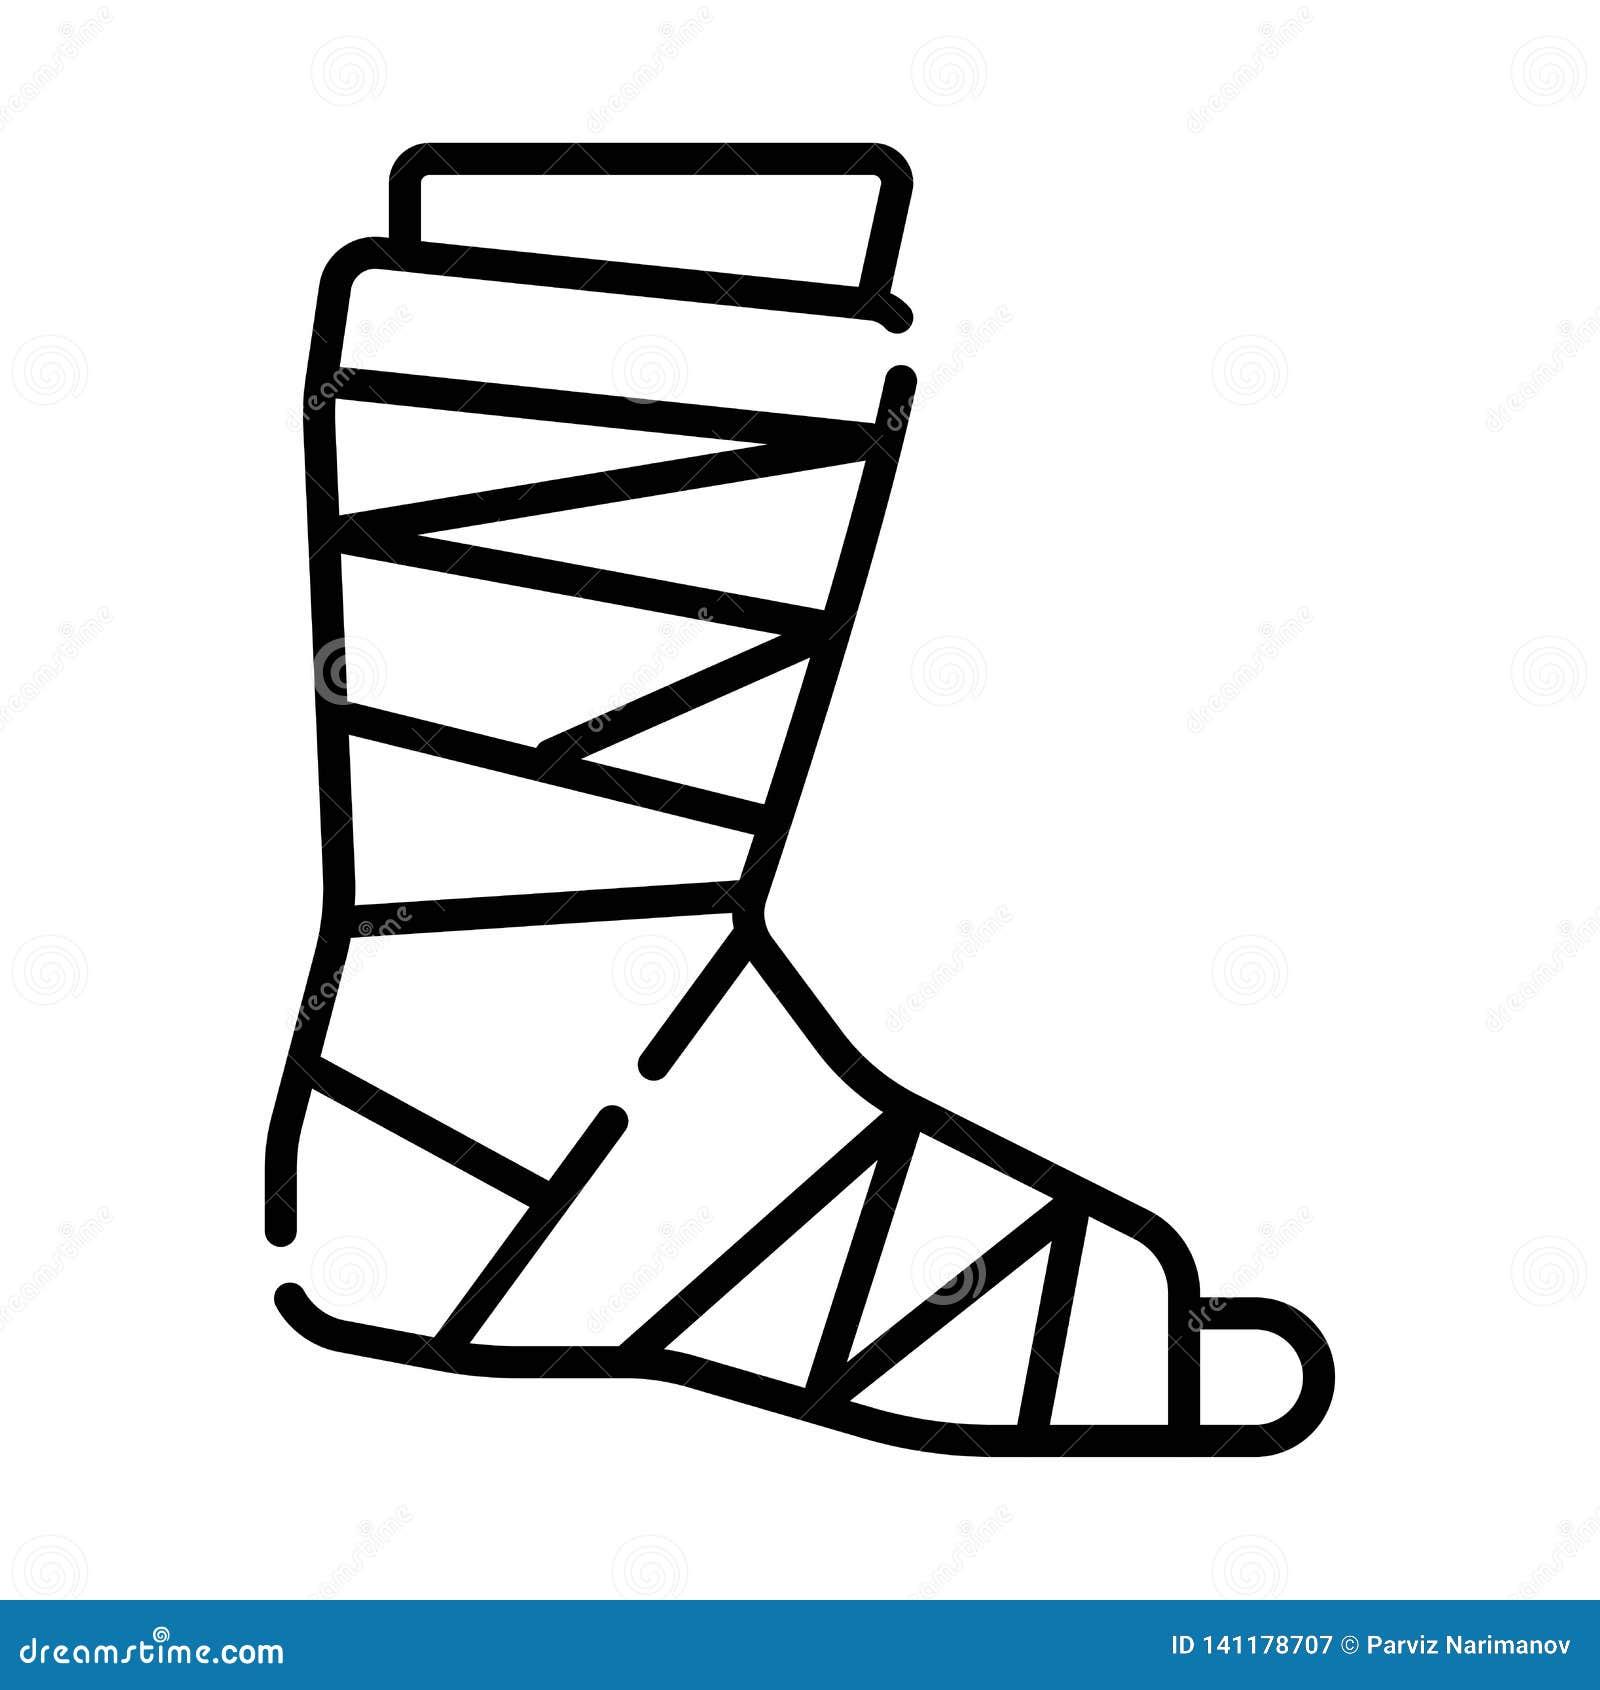 Icône de pied de gypse ou de fonte